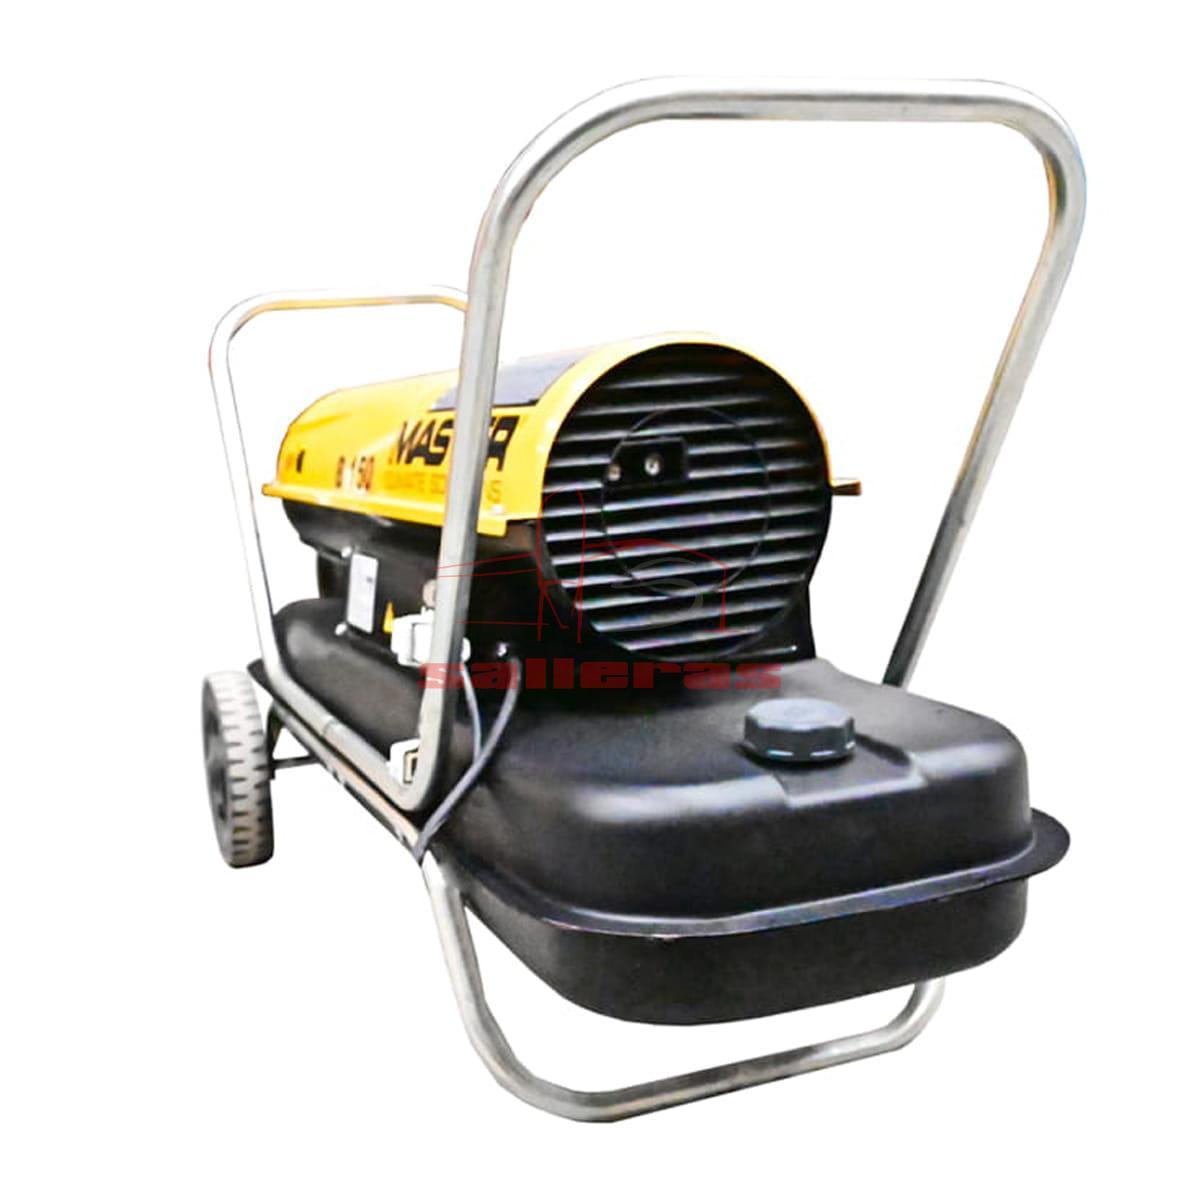 calefactor de gasoil b 150 detras